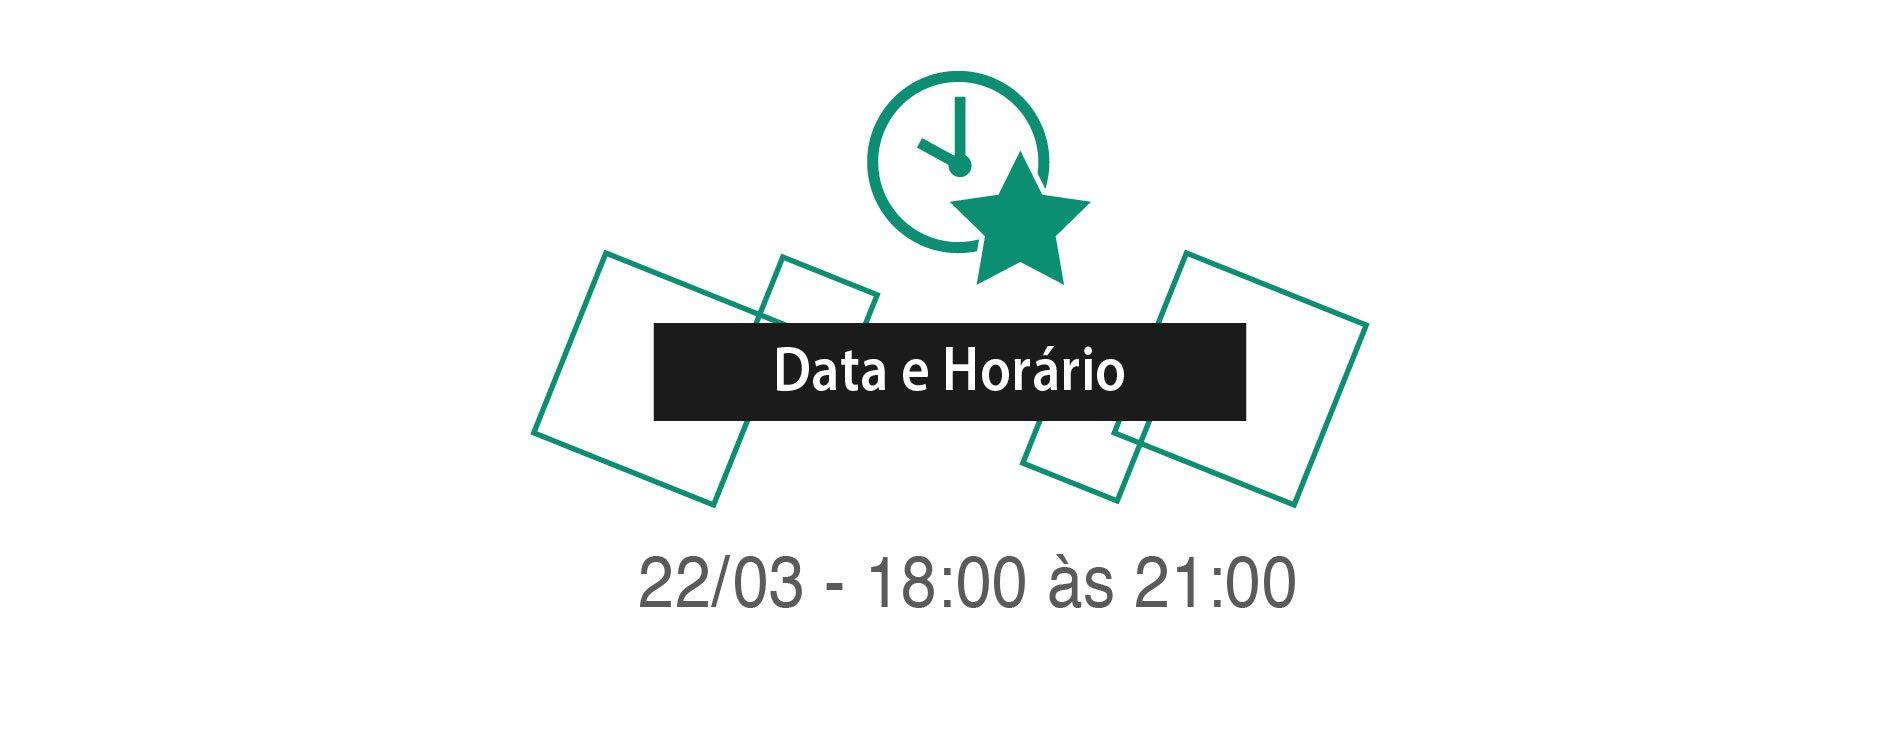 https://www.mestregp.com.br/wp-content/uploads/2018/01/Pagina-Meeting-Project-DataHora-1-1900x736.jpg